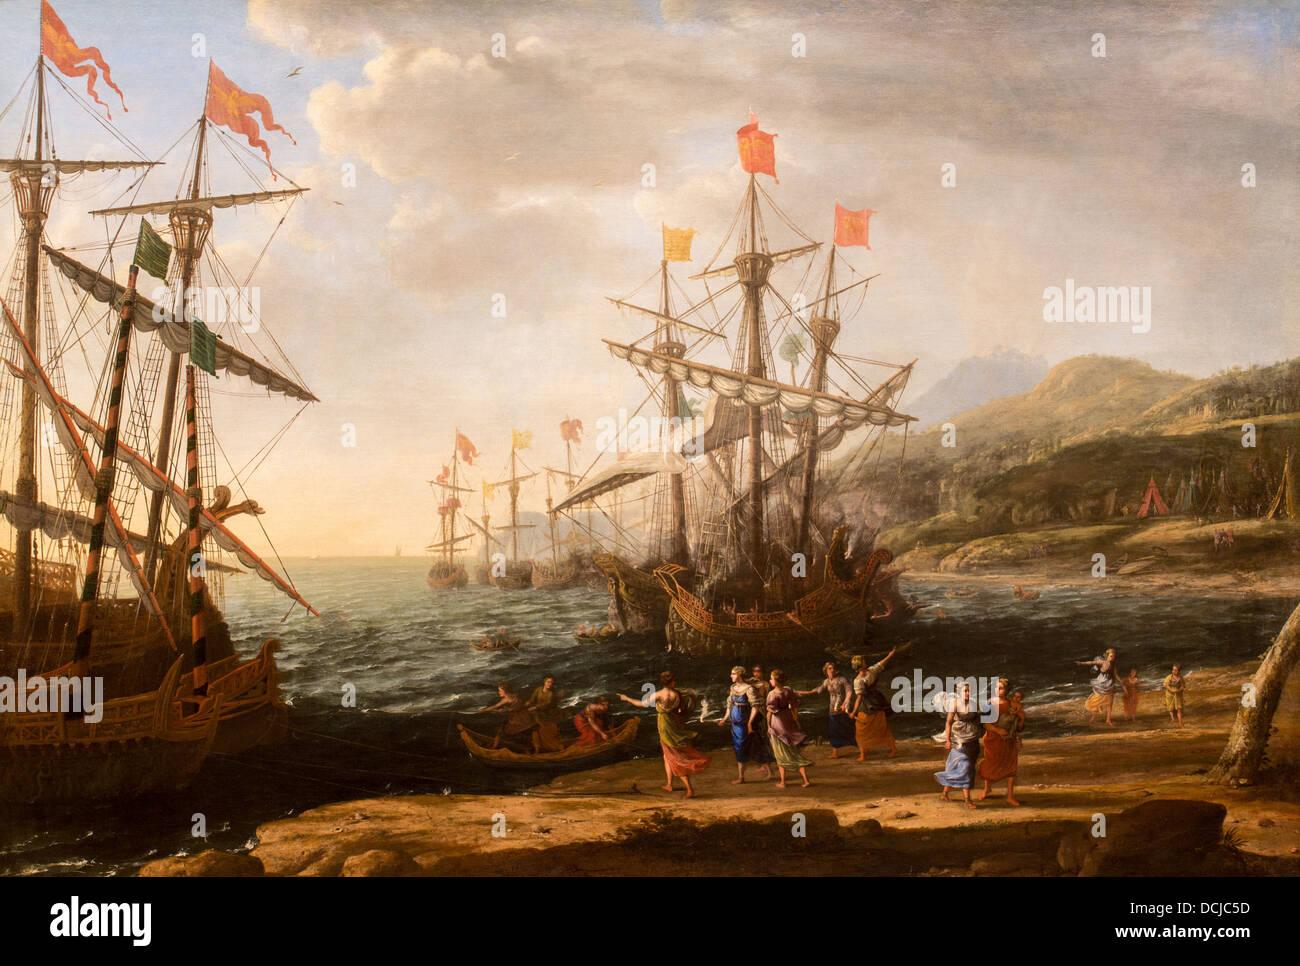 17th century  -  The Trojan Women Setting Fire to Their Fleet, 1643 - Claude Lorrain Philippe Sauvan-Magnet / Active - Stock Image